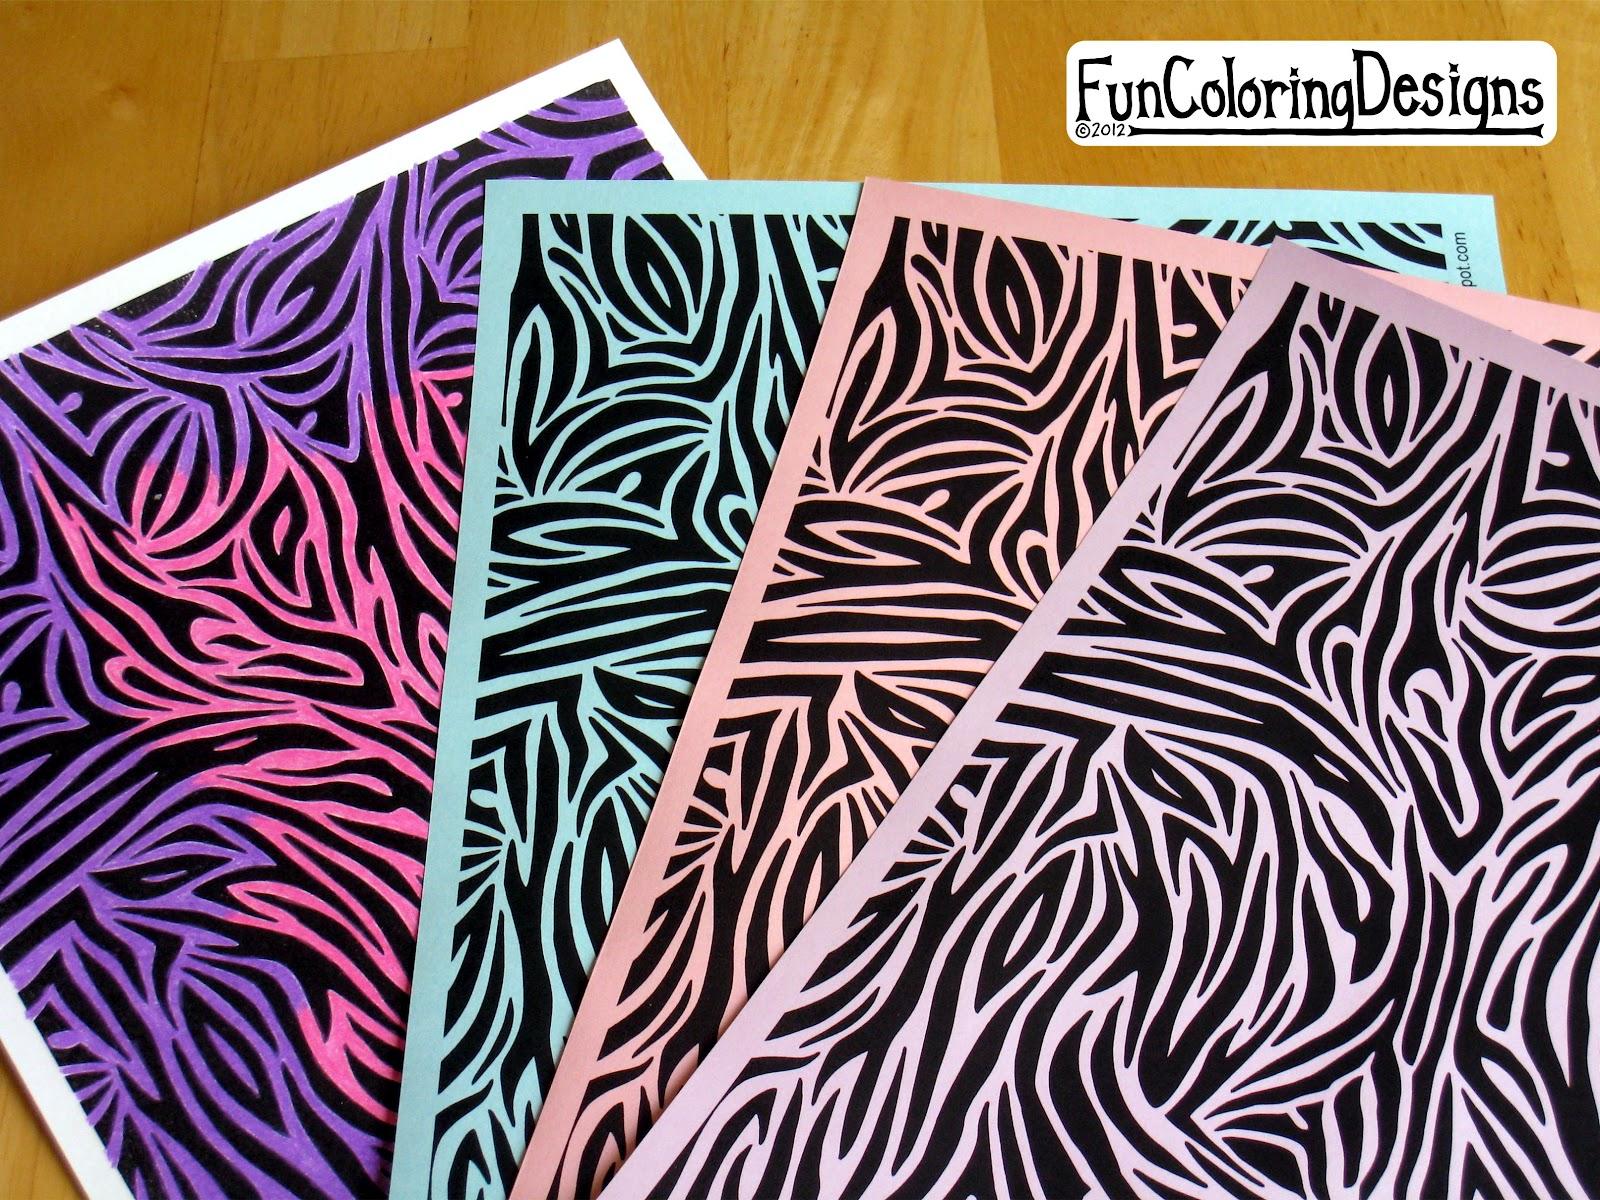 Fun coloring designs free designs